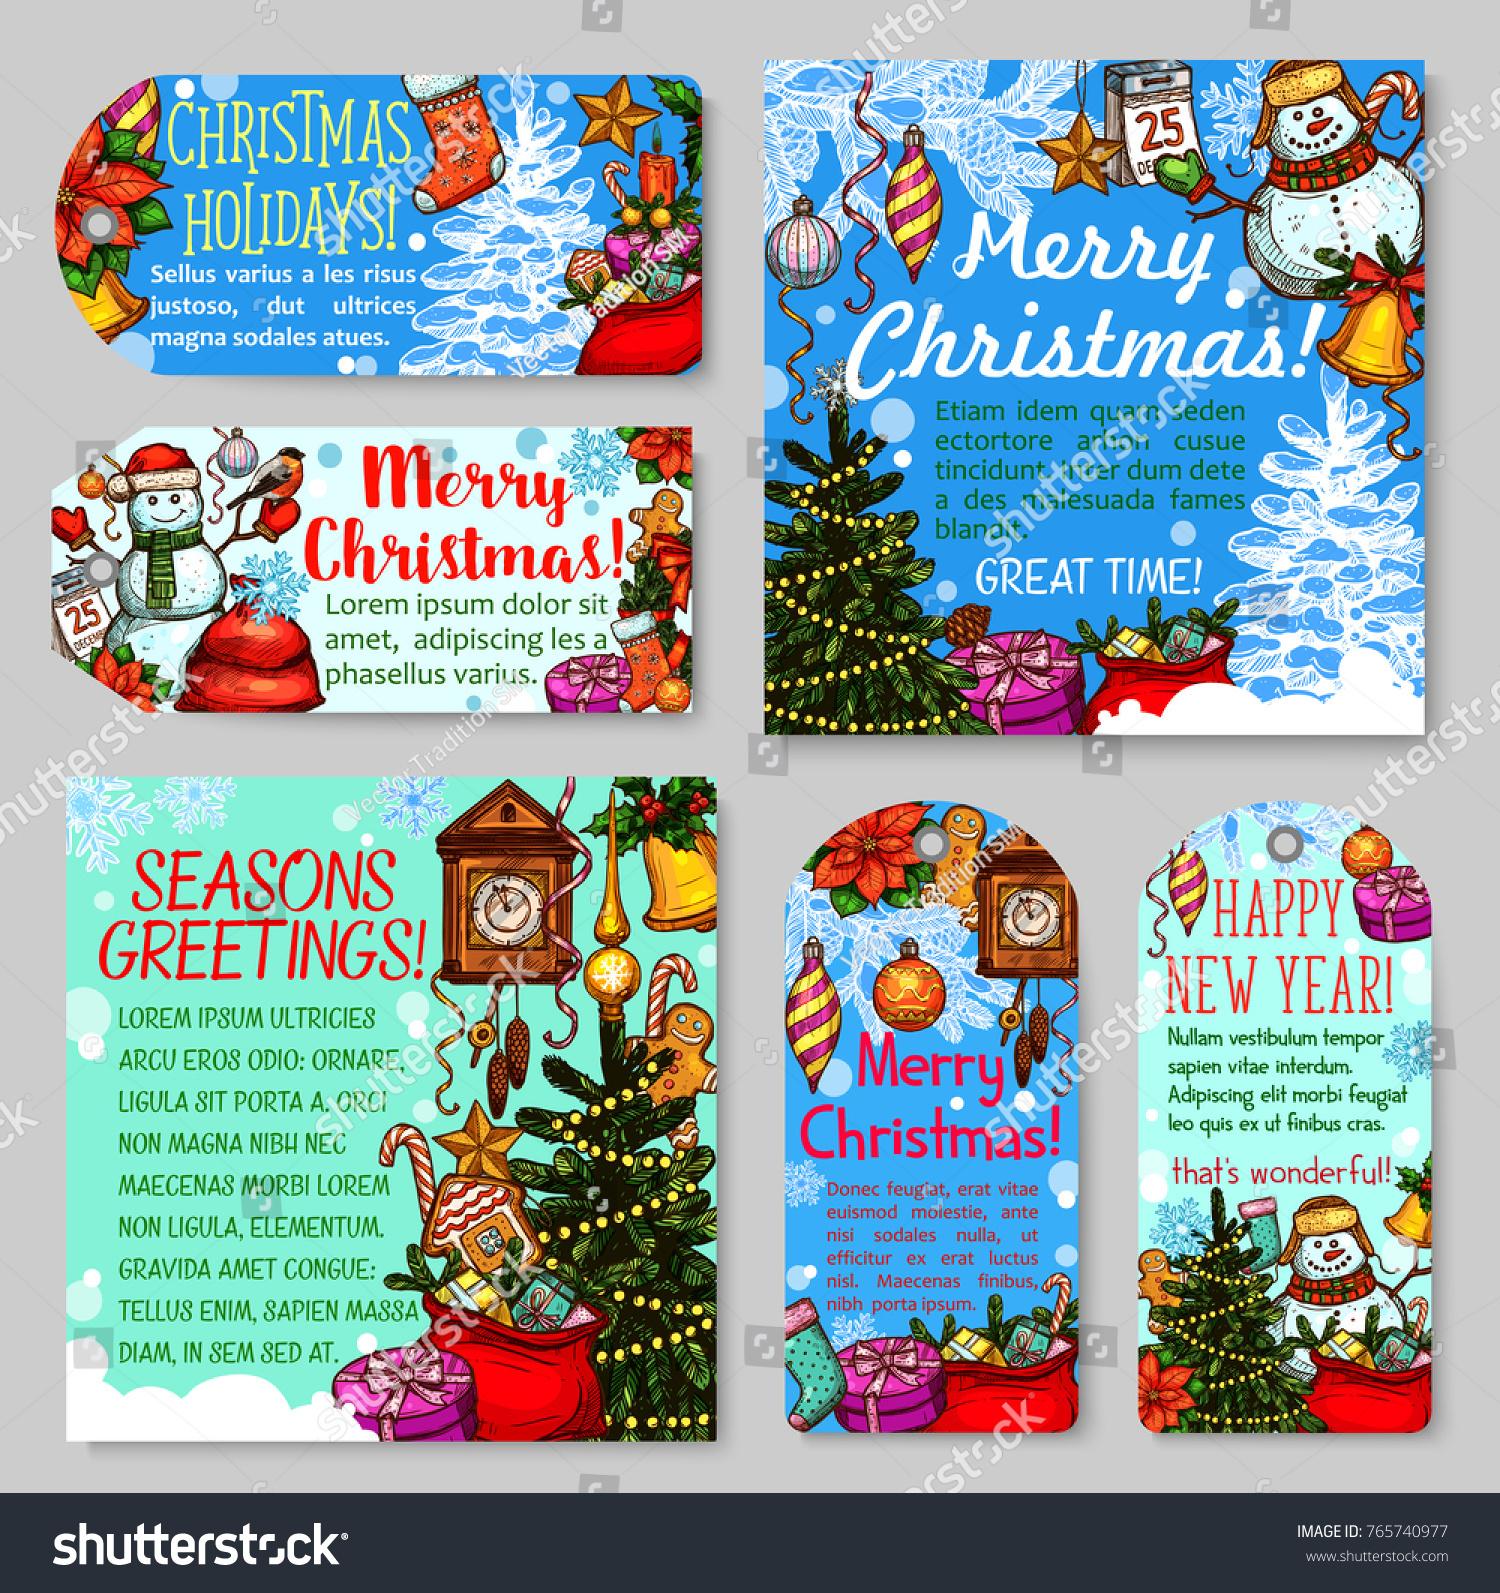 Christmas and New Year holiday gift tag and greeting card set. Xmas tree,  present